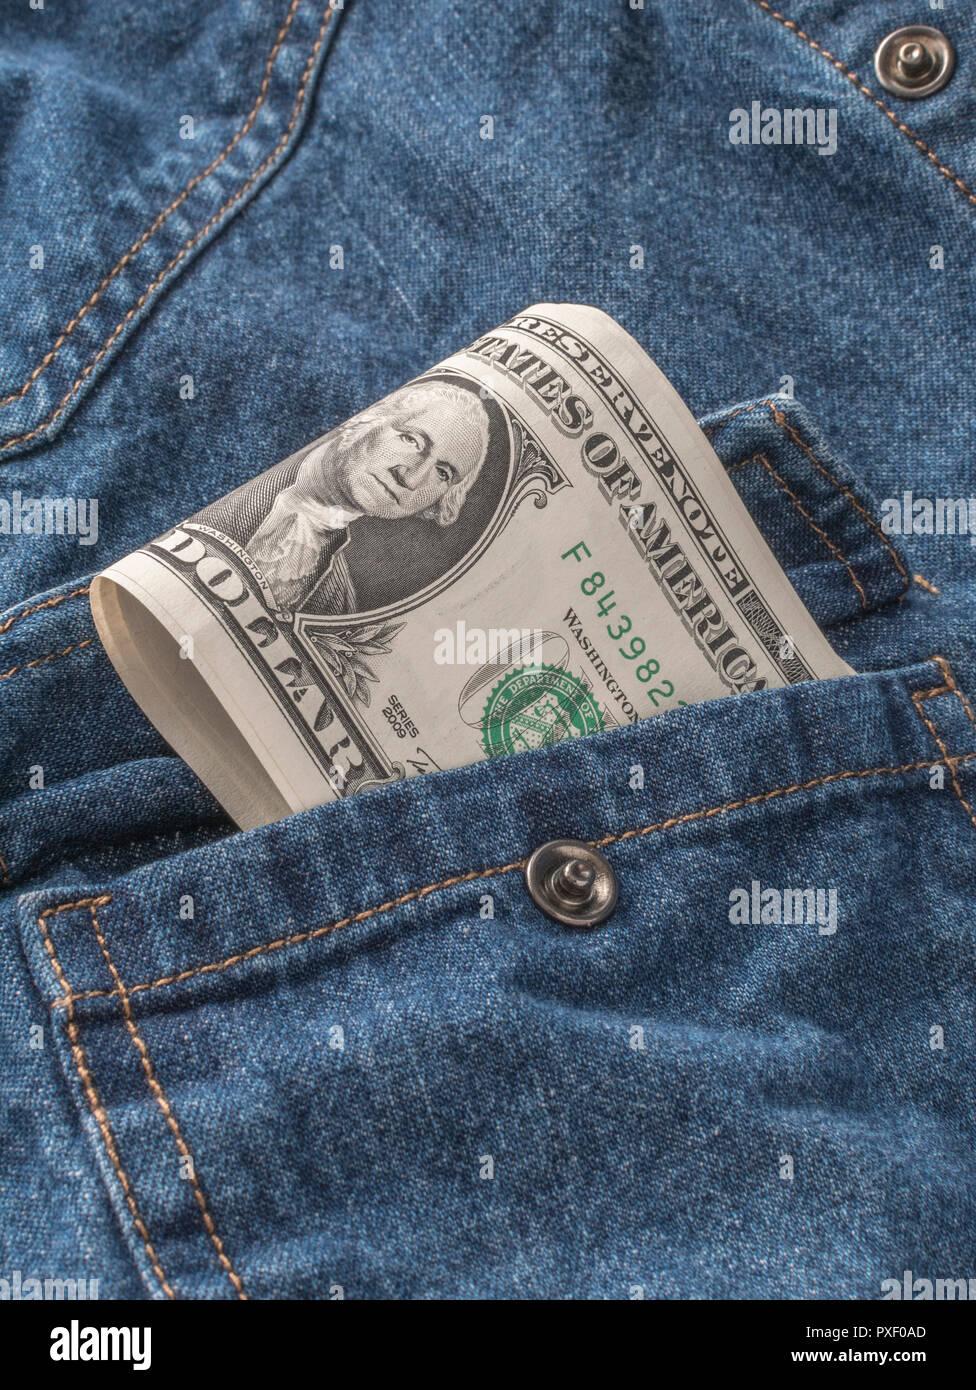 US / American 1 Dollar bills in pocket - metaphor for 'Money in Your Pocket', U.S. earnings. - Stock Image